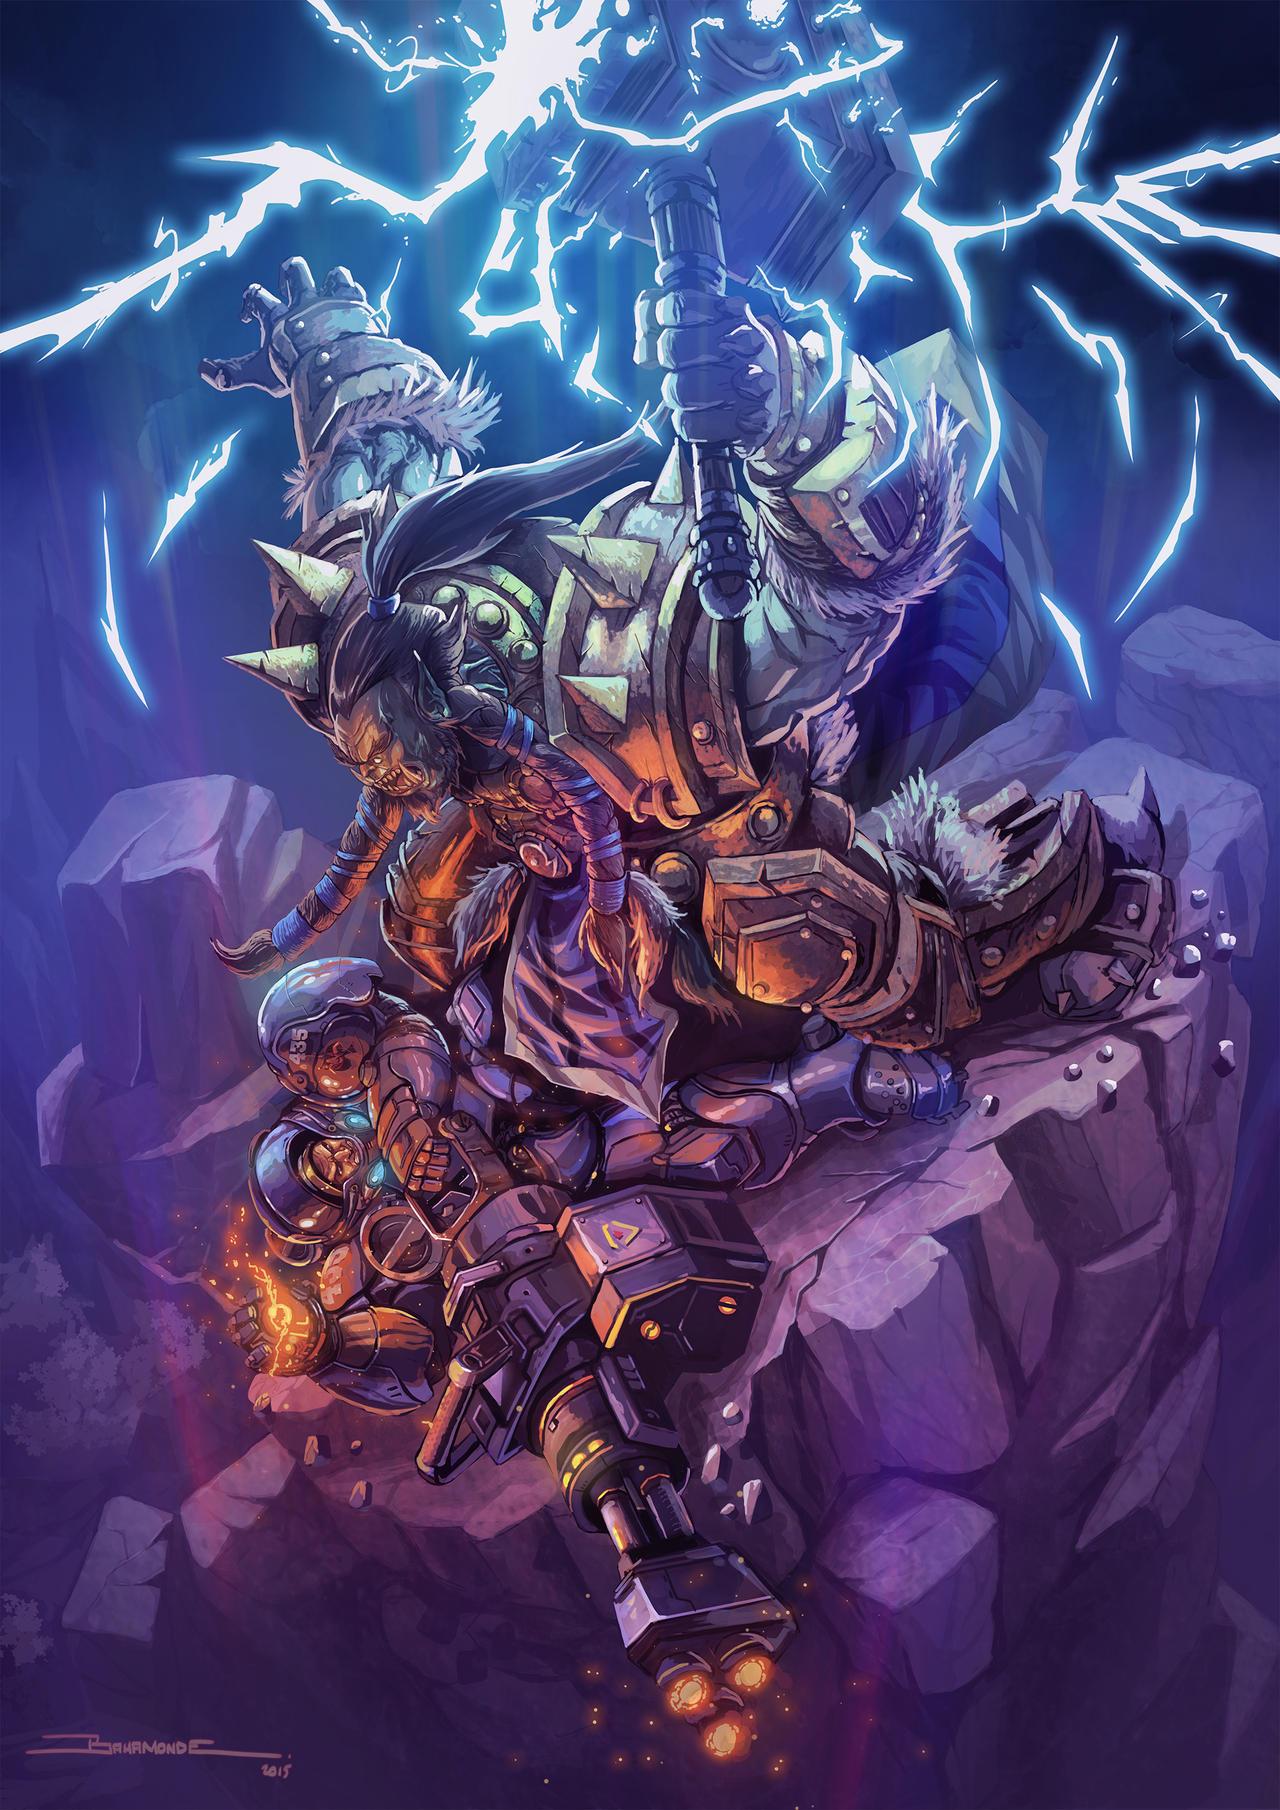 Skill duel by El-Andyjack